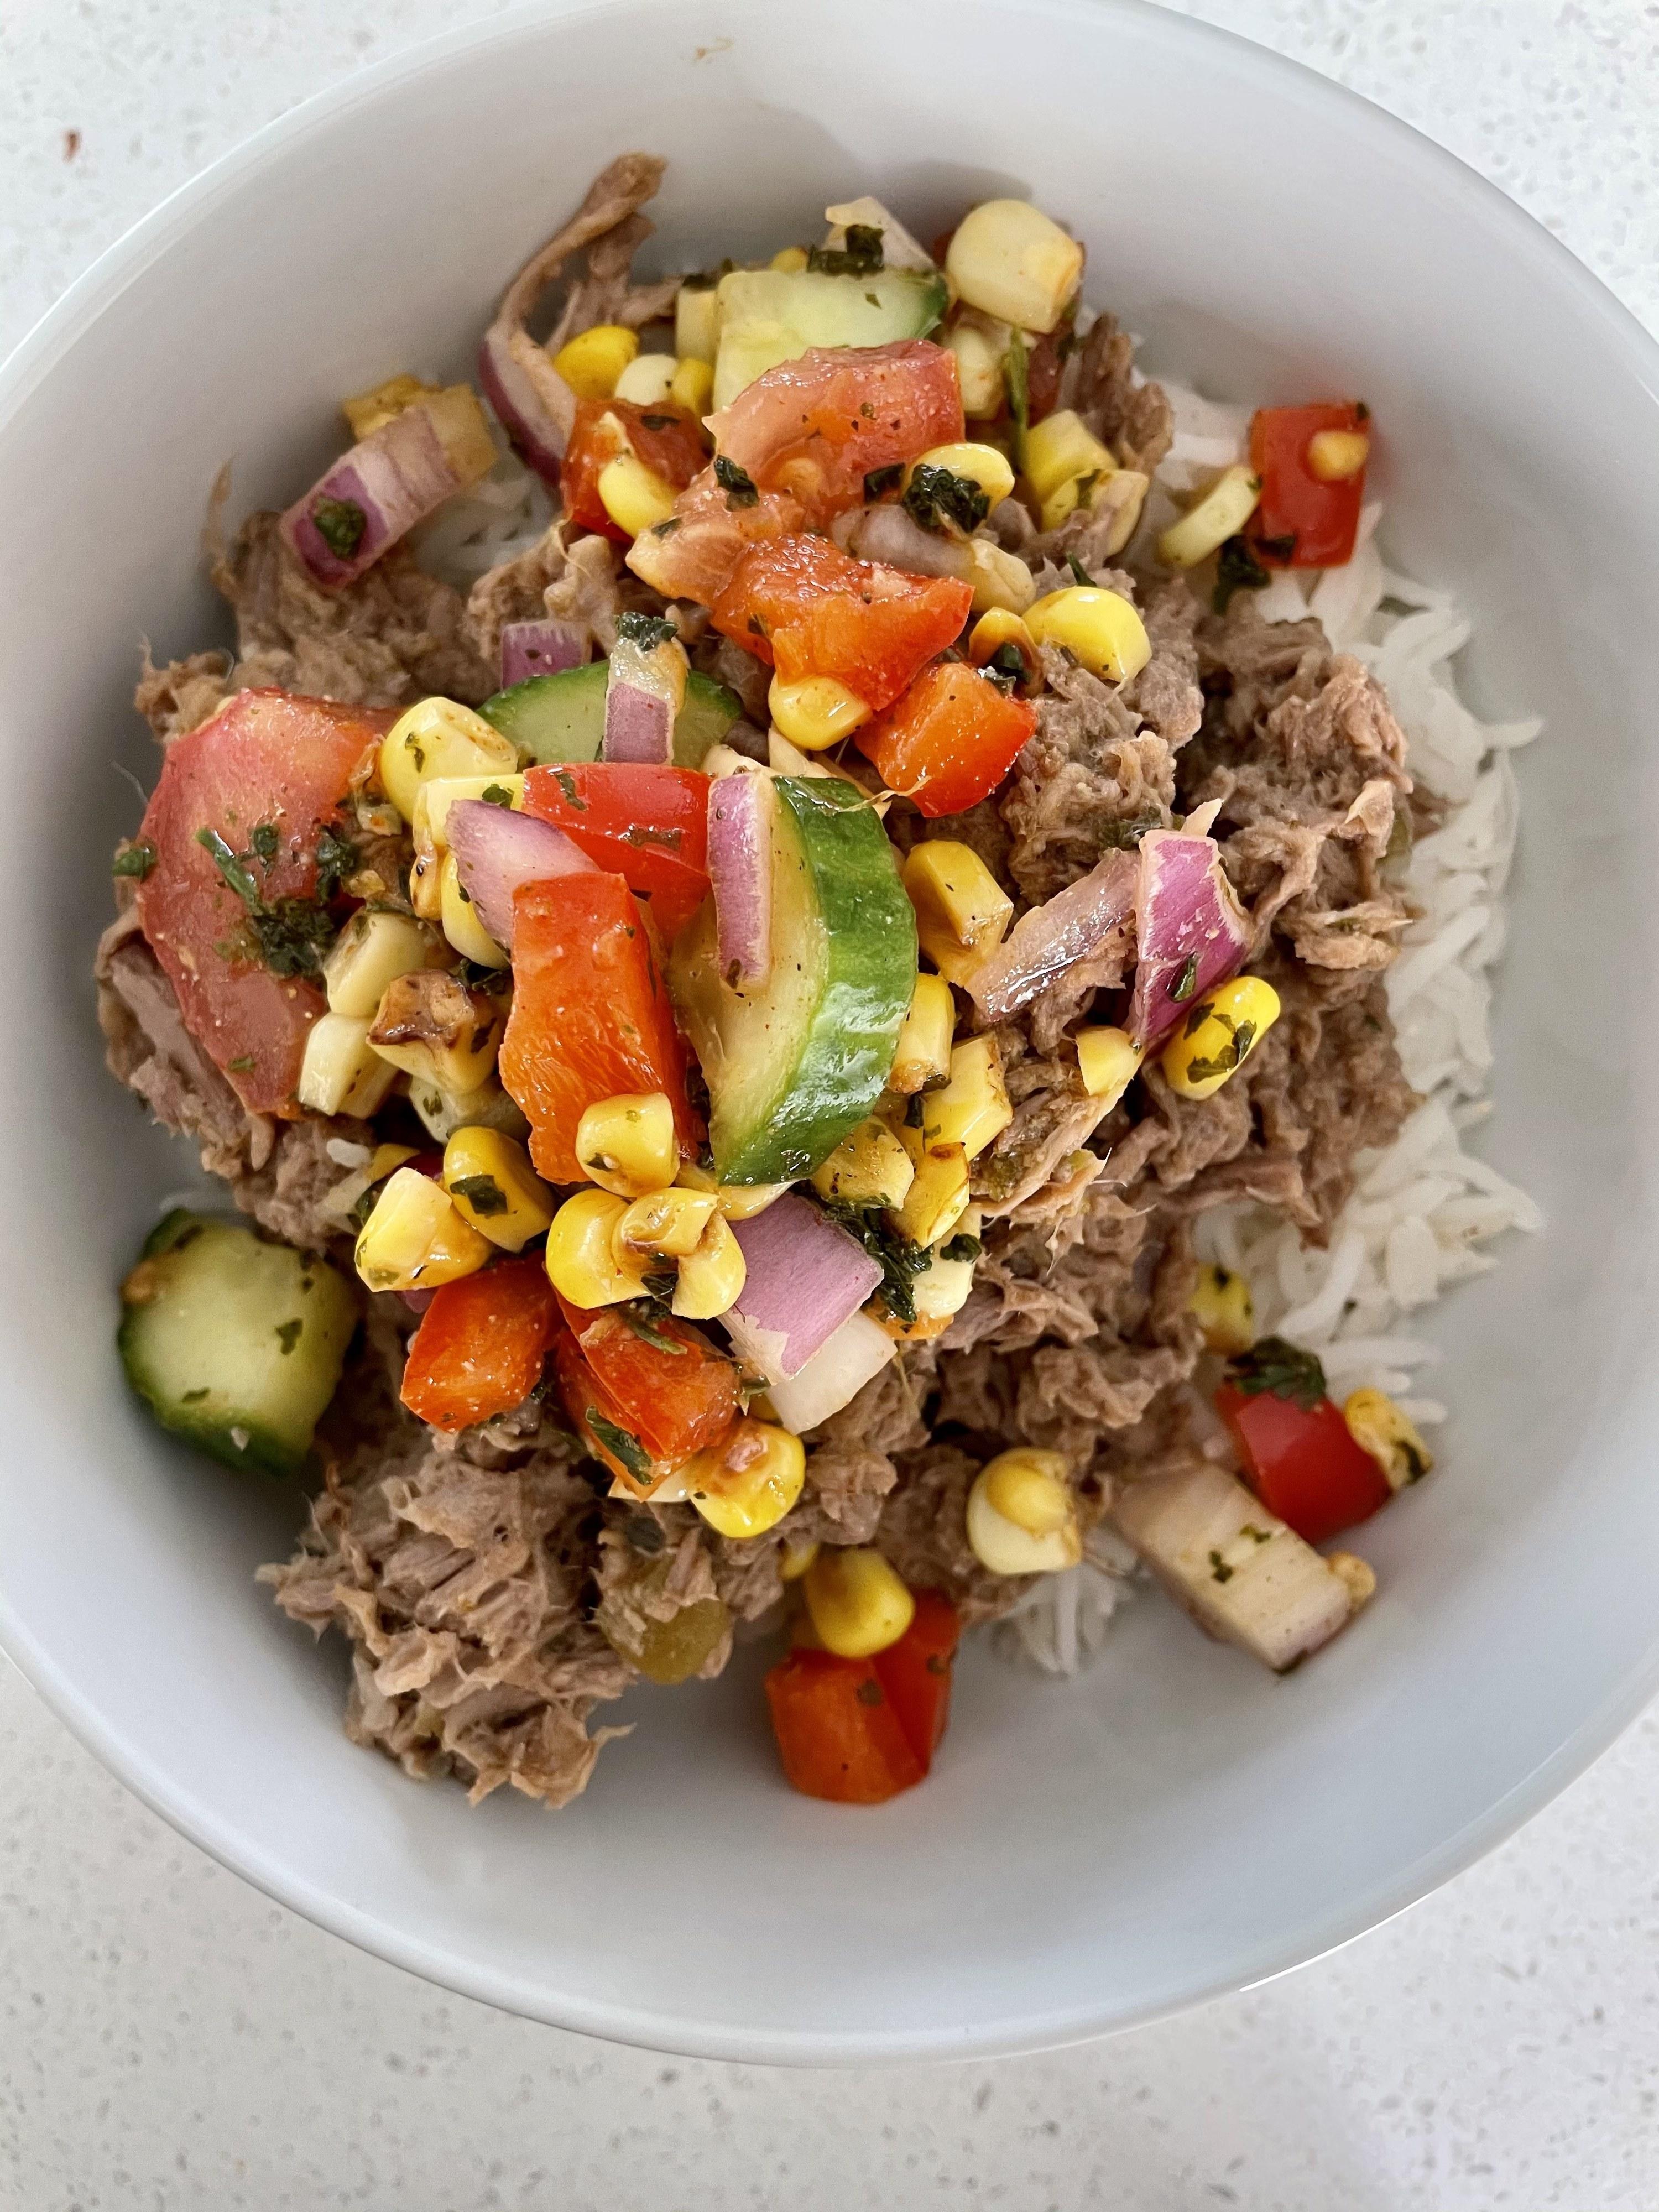 Burrito bowls plated with corn salsa